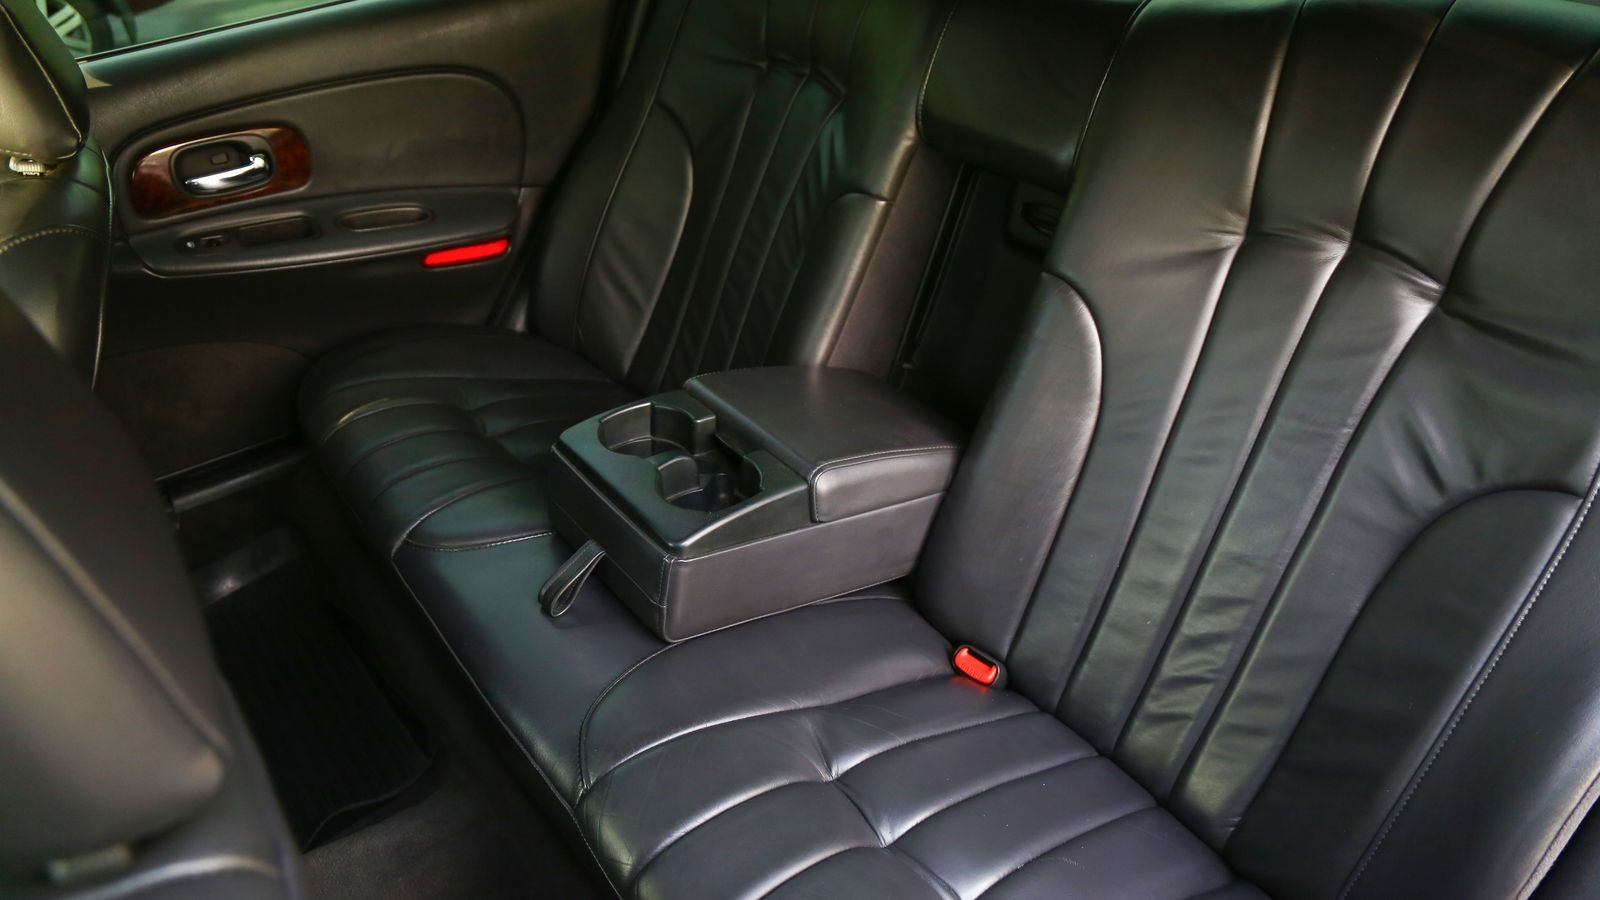 Салон с квартиру и запчасти за копейки: опыт владения Chrysler Concorde за 220 000 рублей